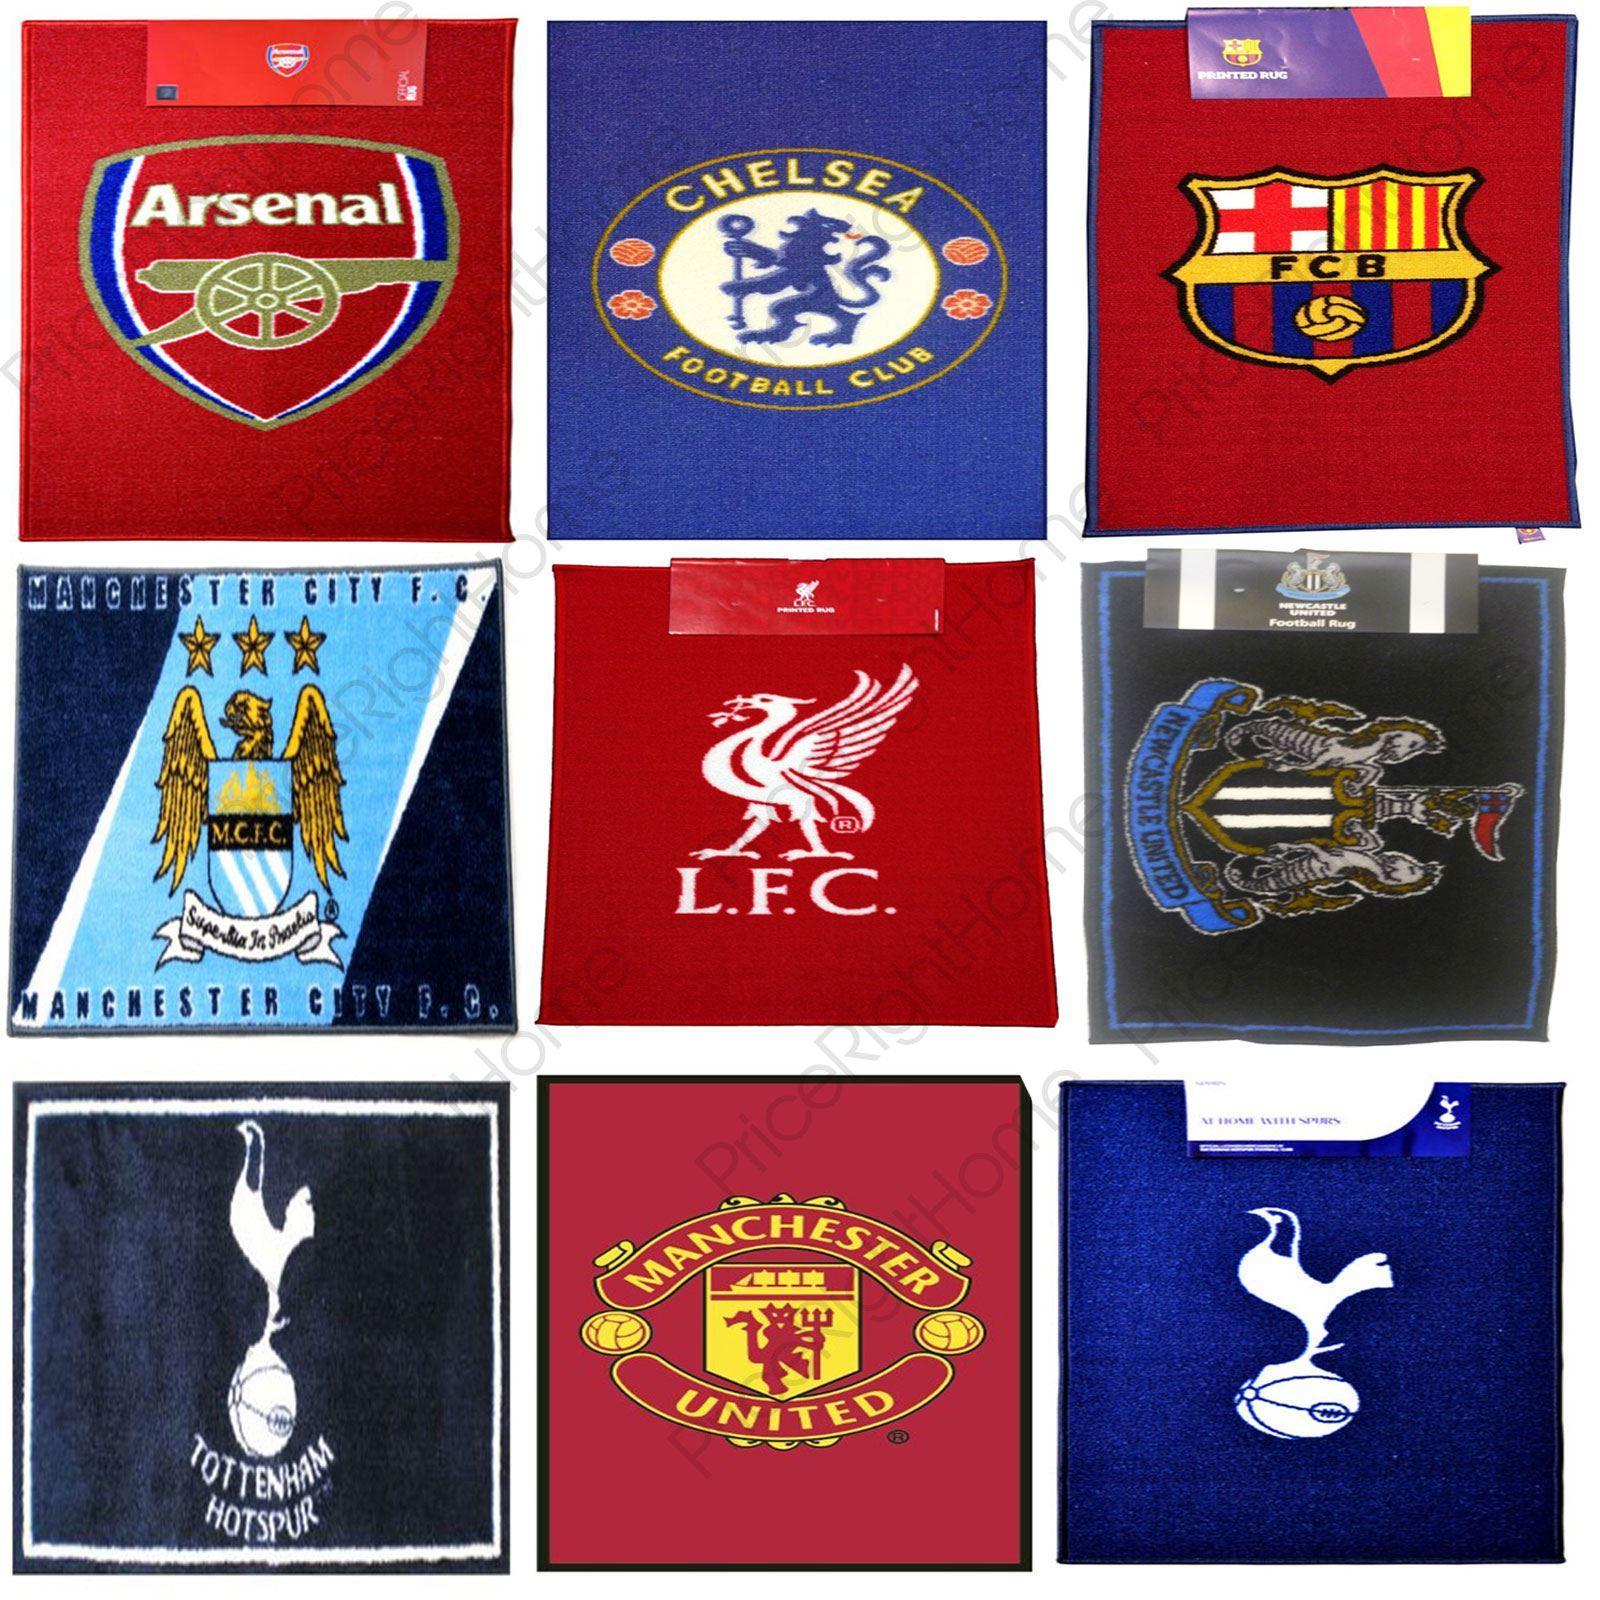 VARIOUS FOOTBALL TEAM RUGS CHELSEA, BARCELONA, ARSENAL